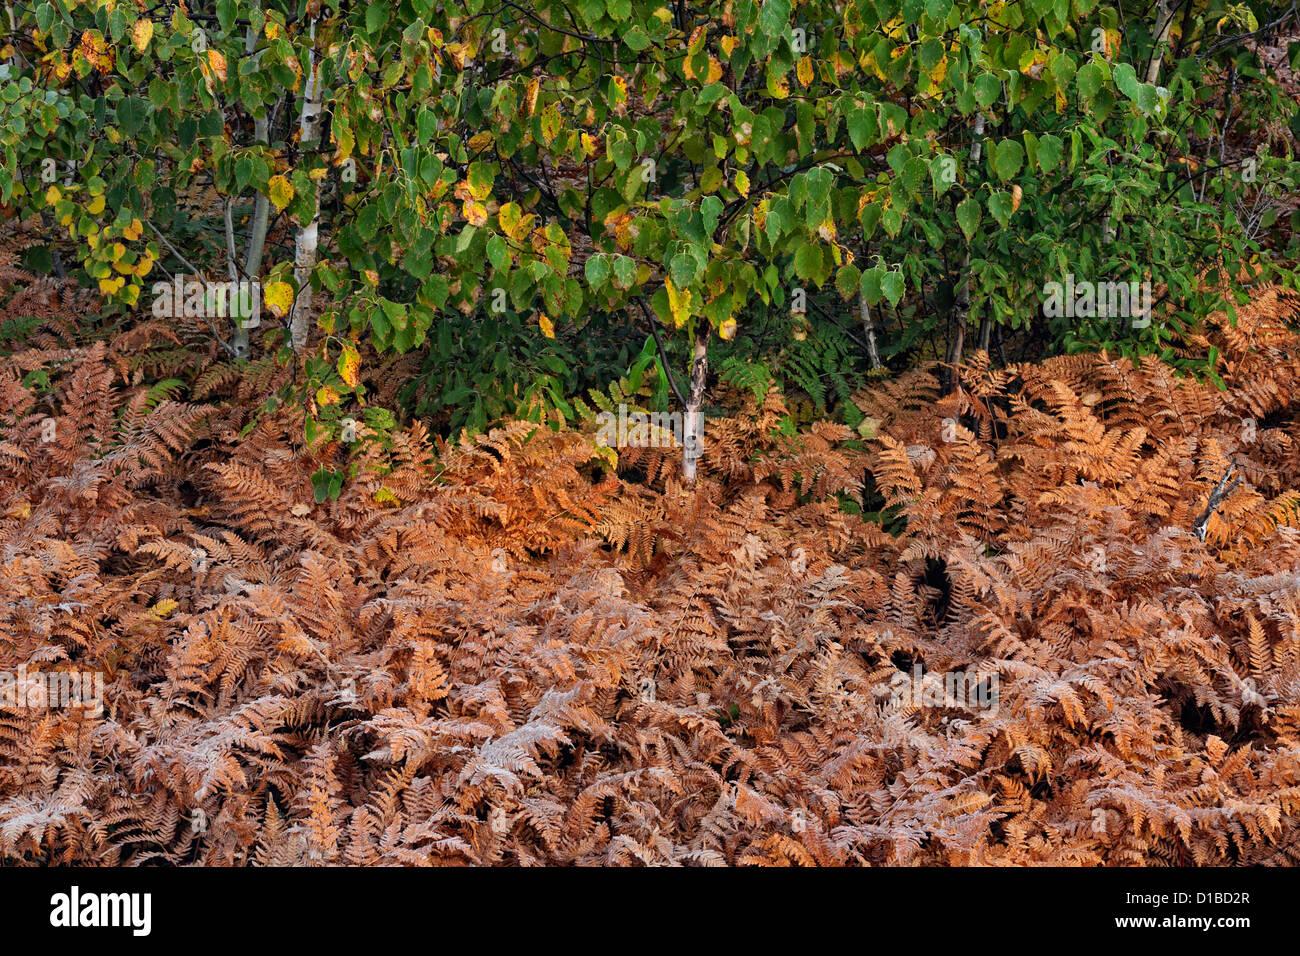 Roadside bracken ferns and aspens, Greater Sudbury, Ontario, Canada - Stock Image